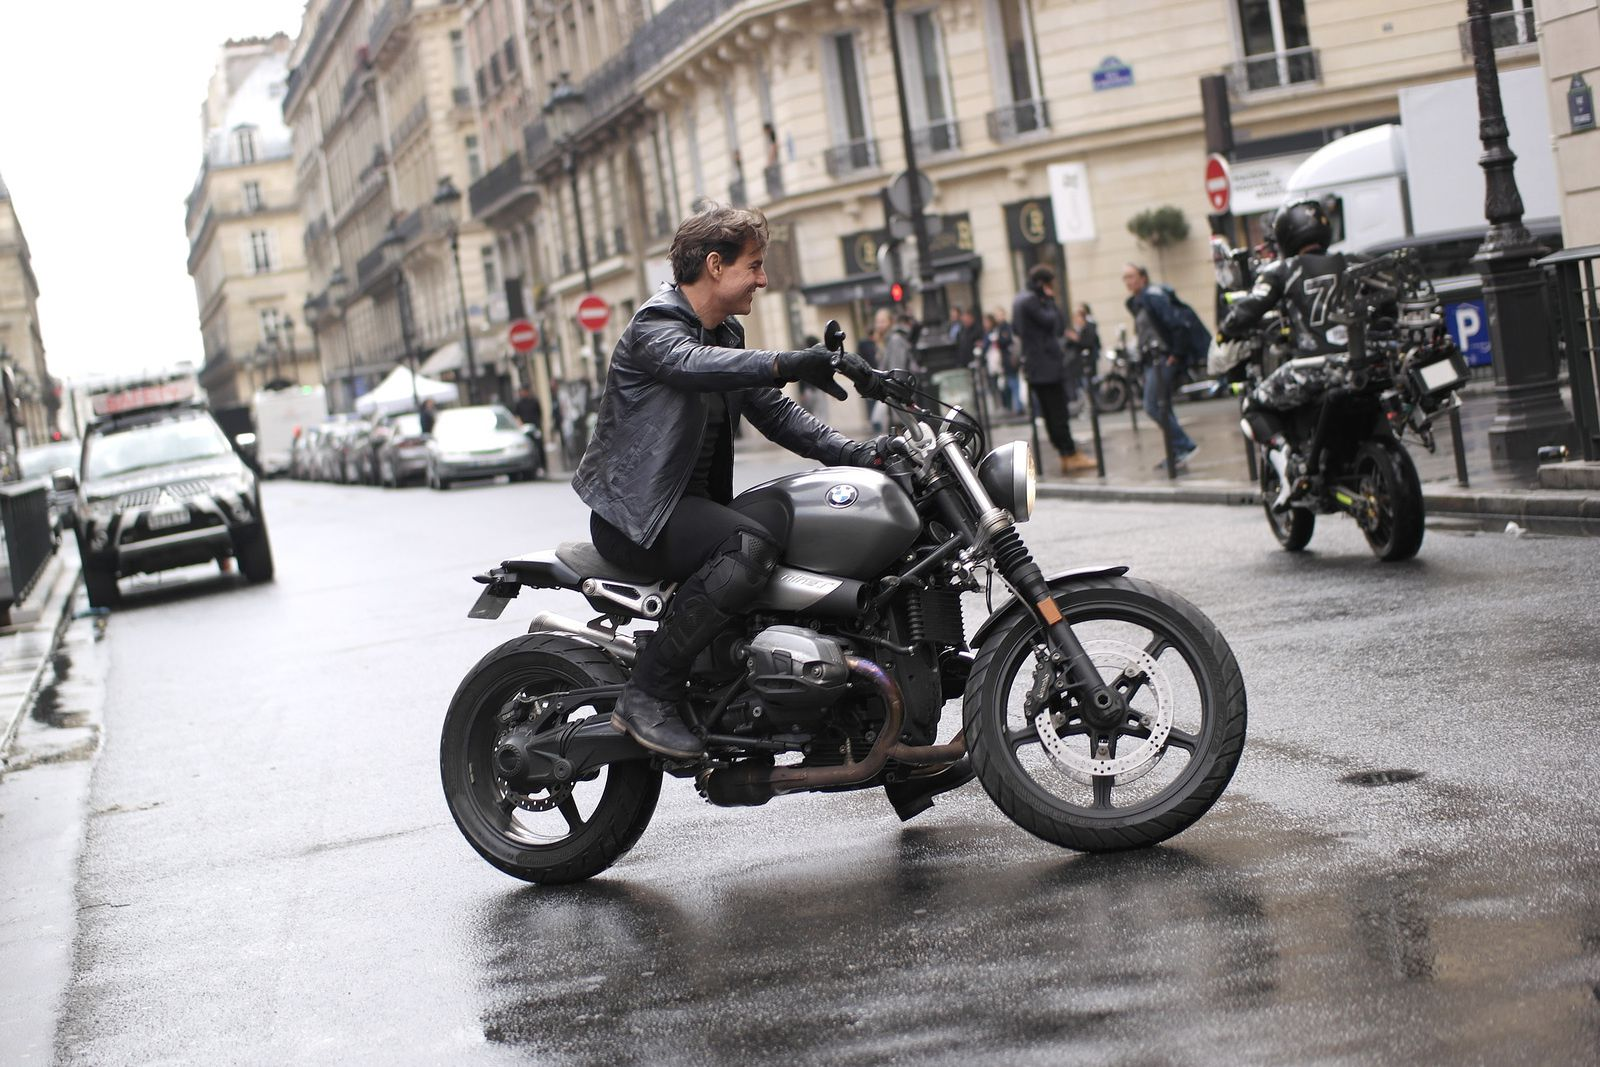 La moto camera film Tom Cruise